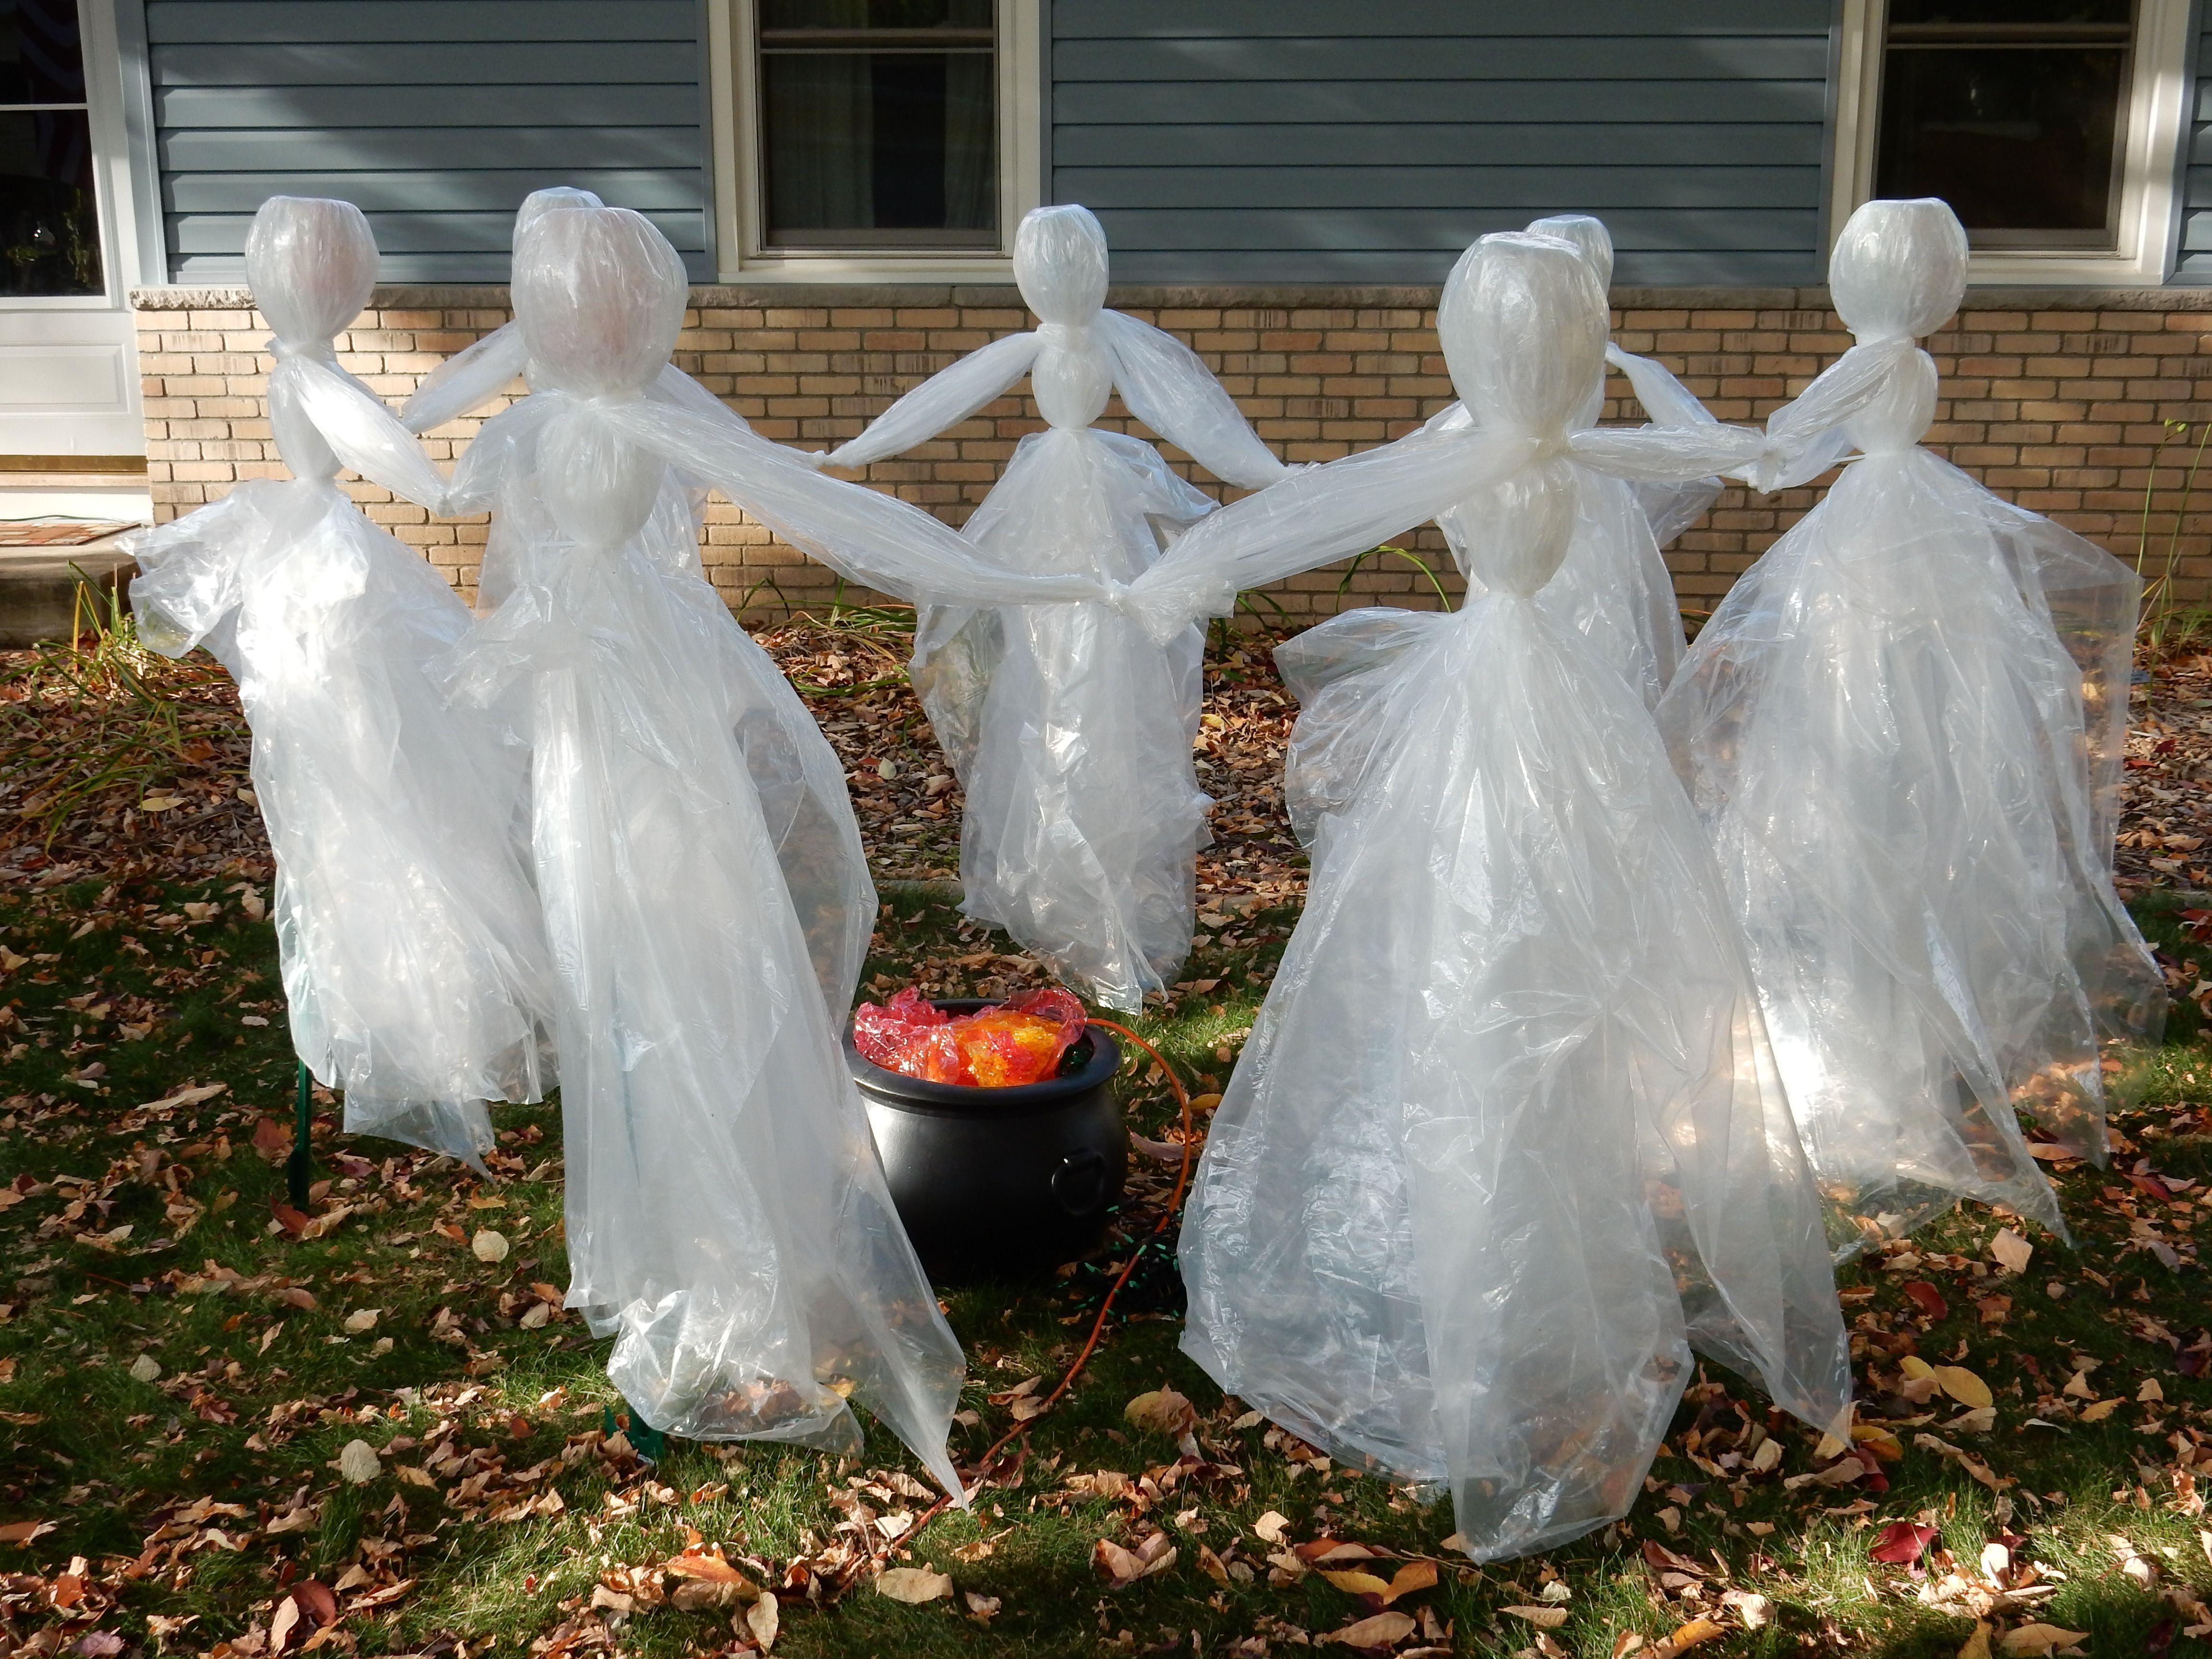 Halloween 2014 Build -- Ghost Dancers. Seven 5 ft fence posts, 10x10 plastic drop cloths, bubble wrap, zip ties. Less than $6 each, less than 1 hr to assemble.